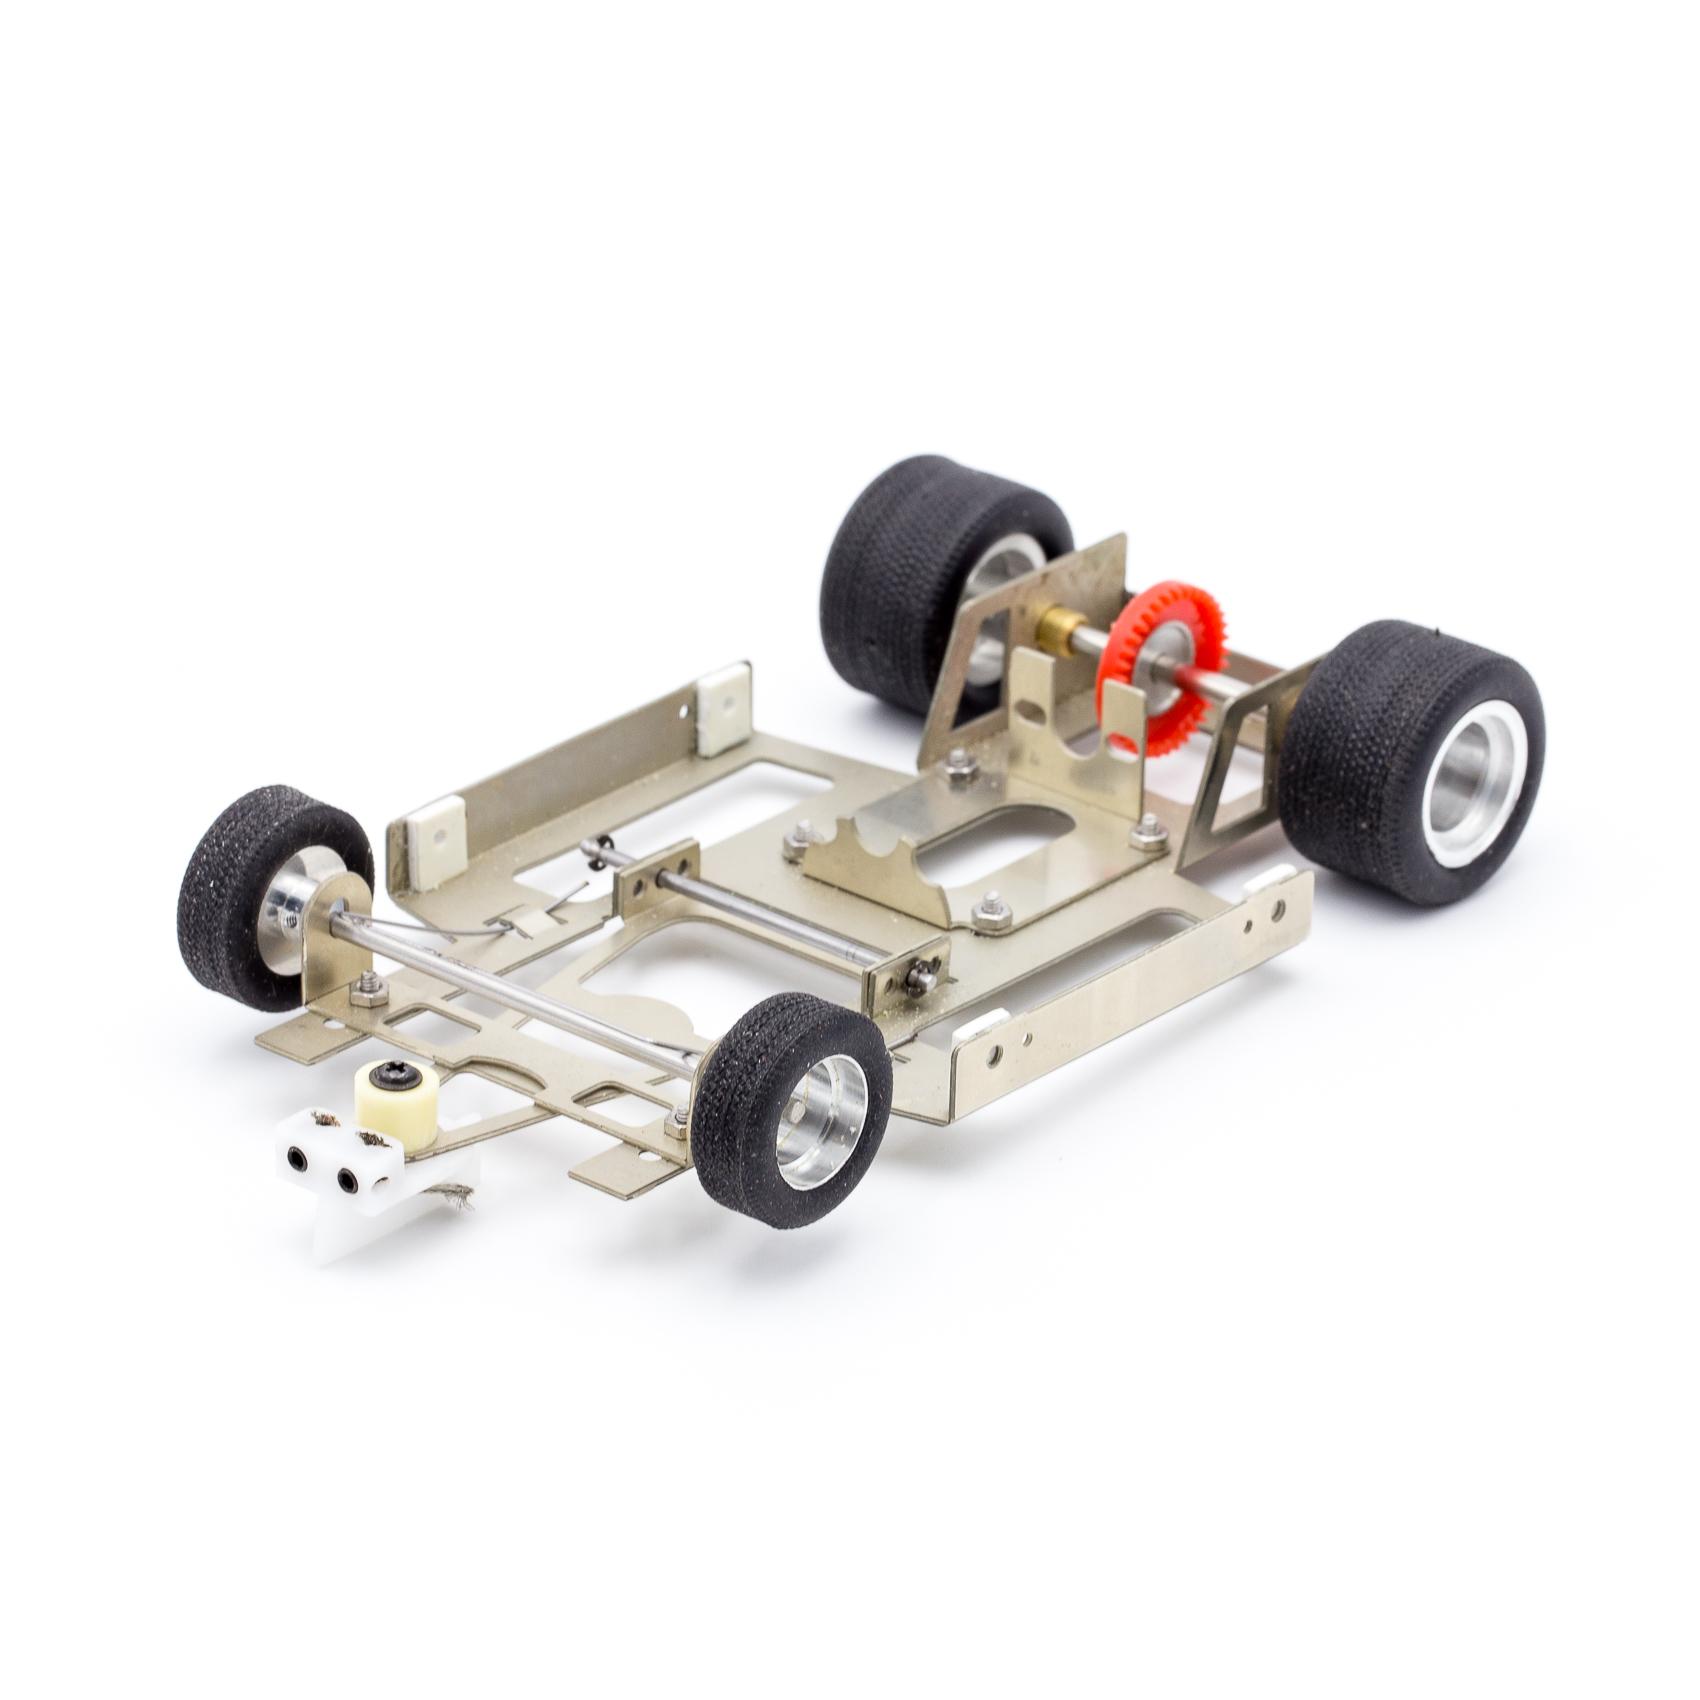 https://www.orlandinifrancesco.com/wp/wp-content/uploads/2019/06/Telaio-Slot-Car-Monza-1-24-Montato-1.jpg